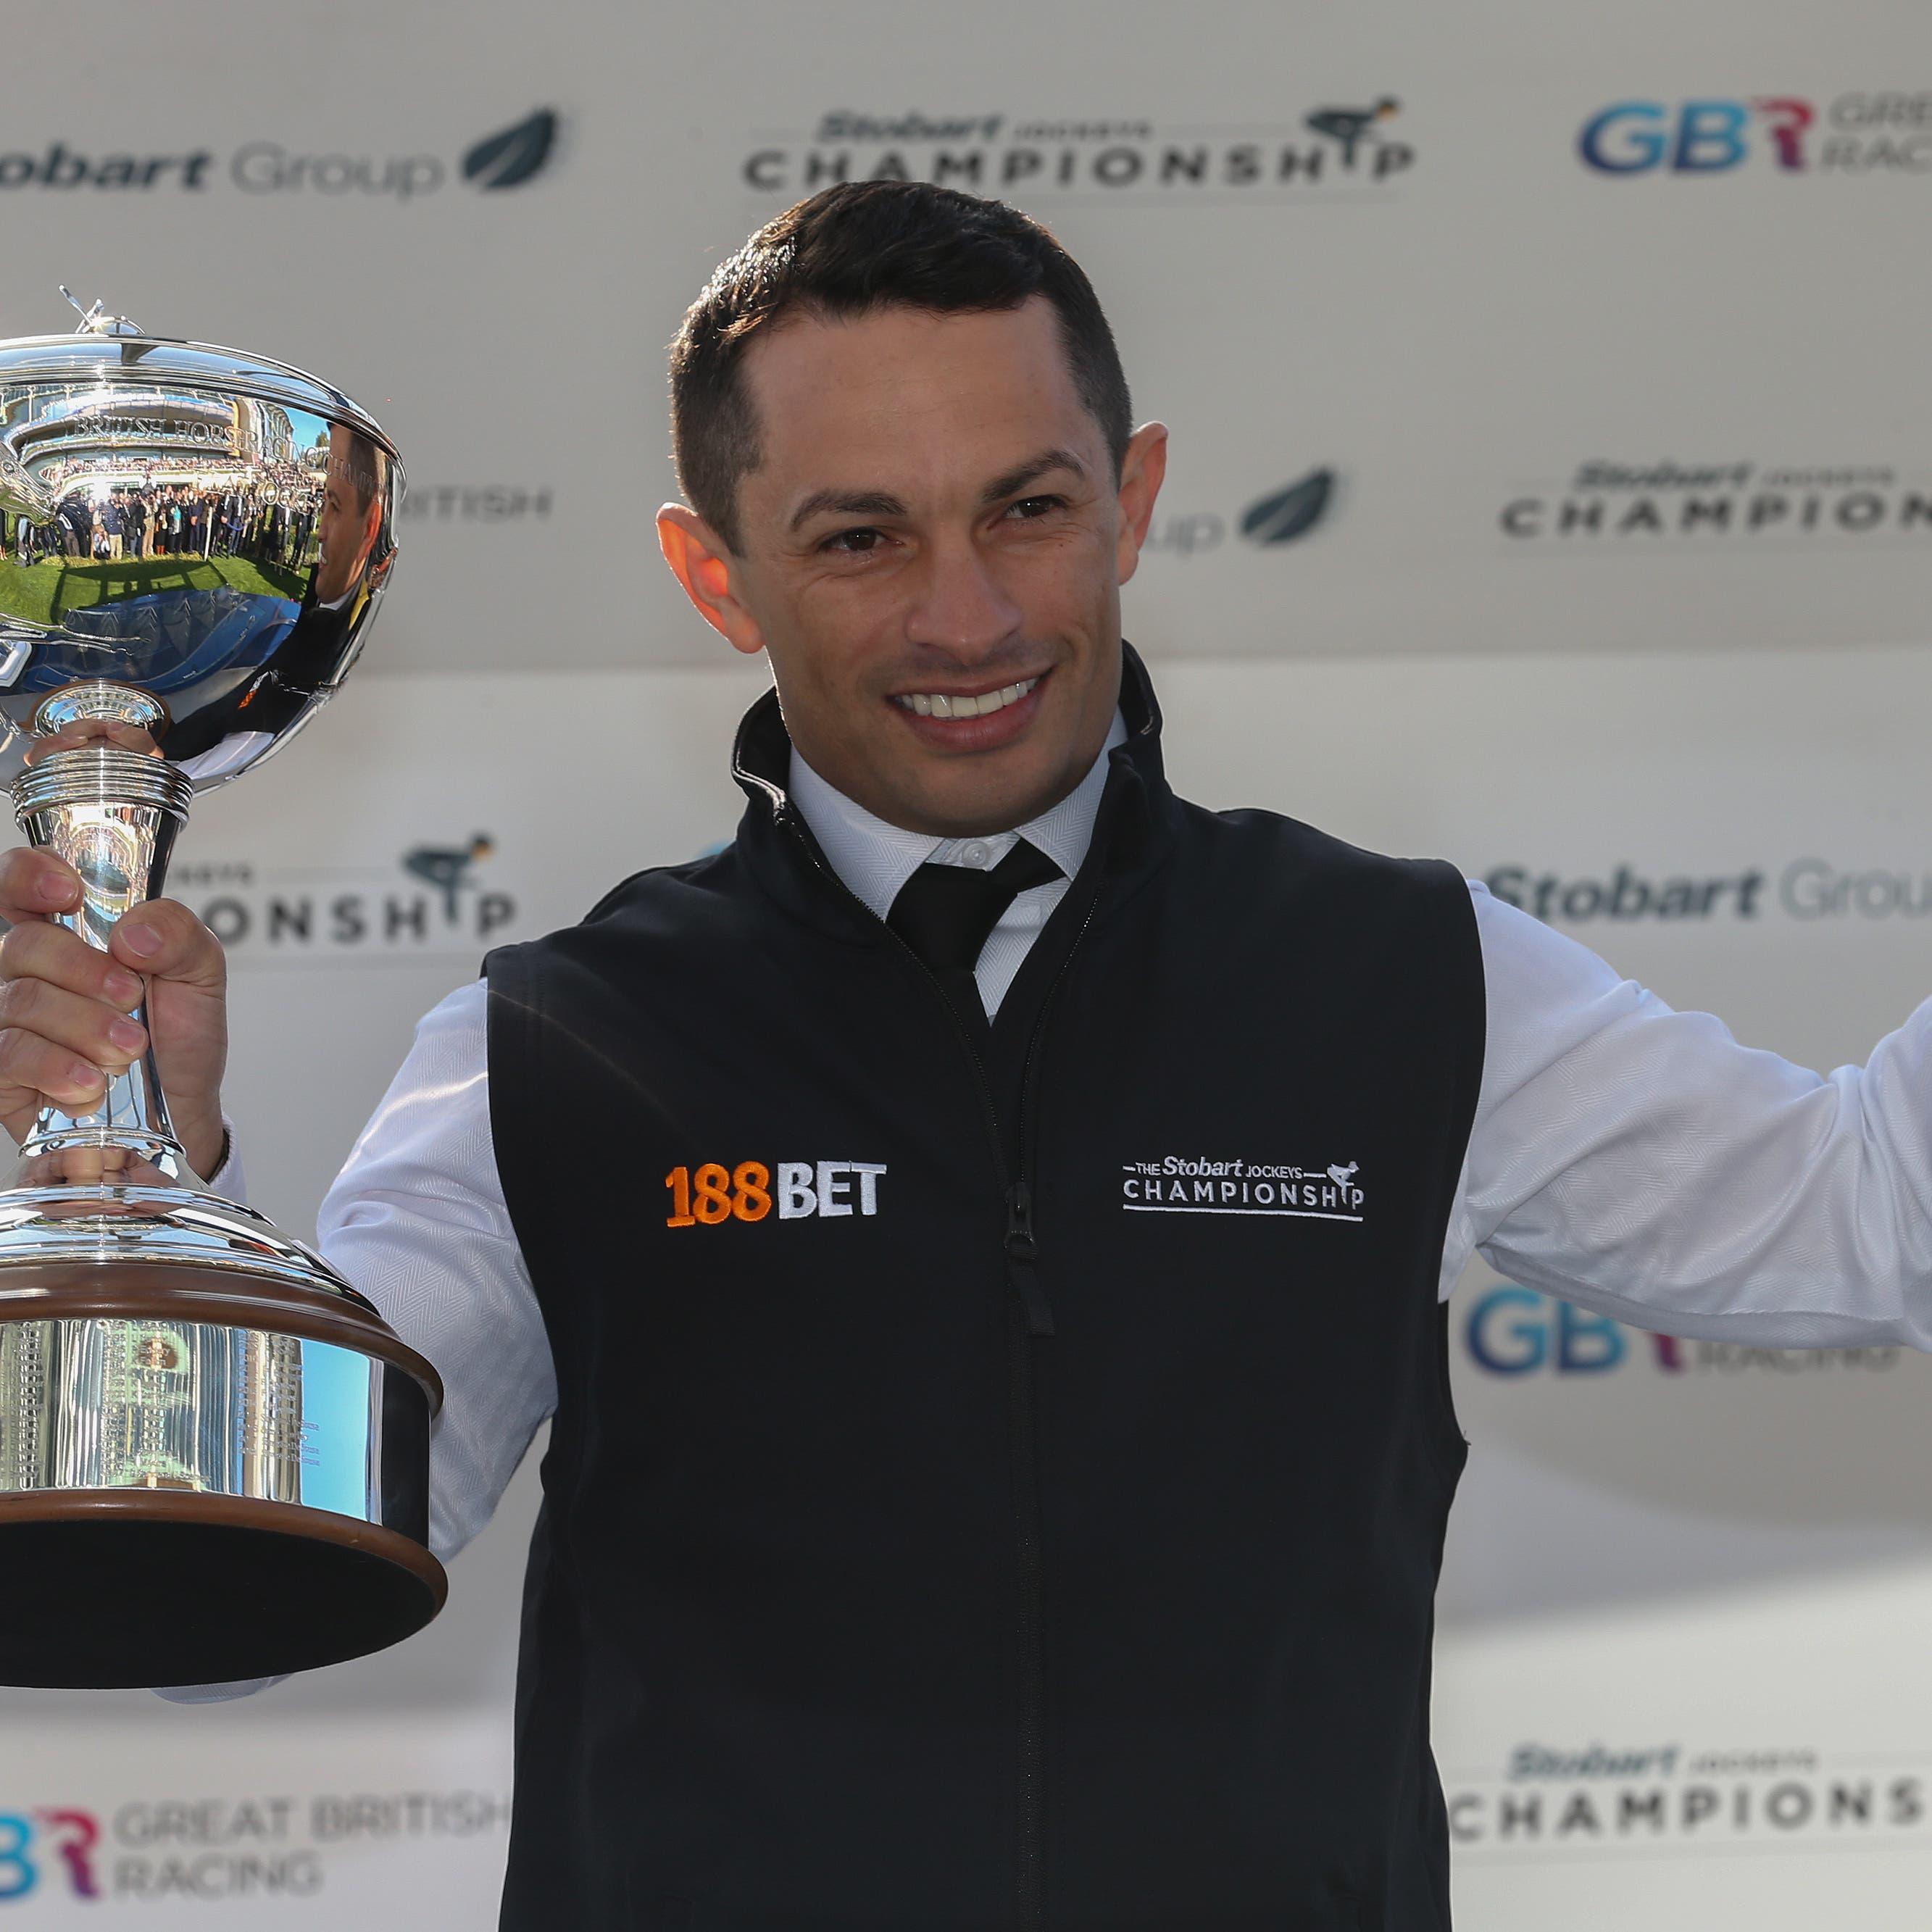 Silvestre De Sousa was crowned British champion again this season